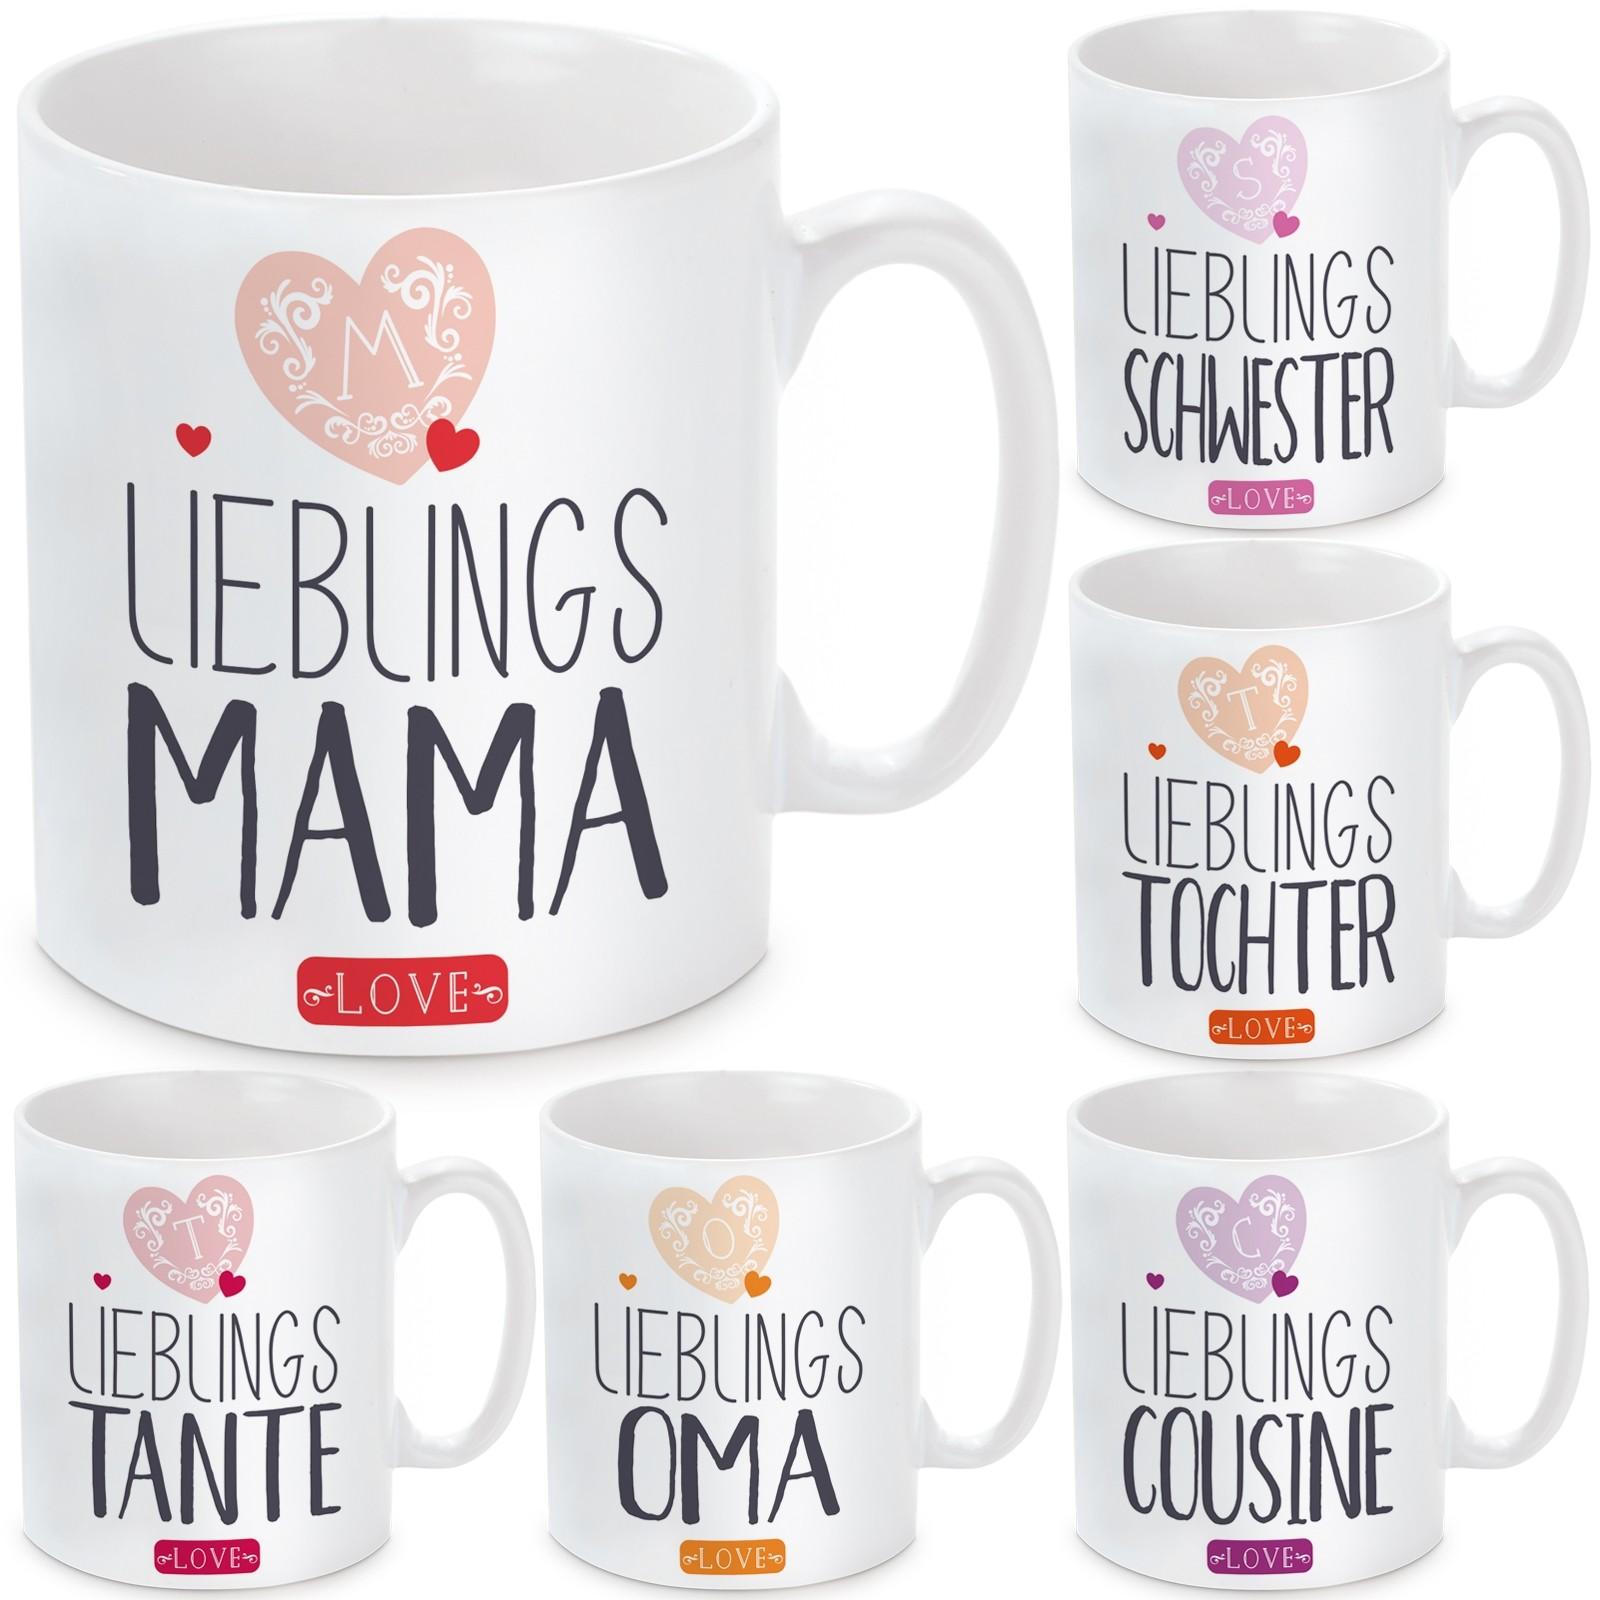 Tasse mit Motiv - Lieblings- Oma / Mama / Schwester / Tochter / Tante / Cousine.